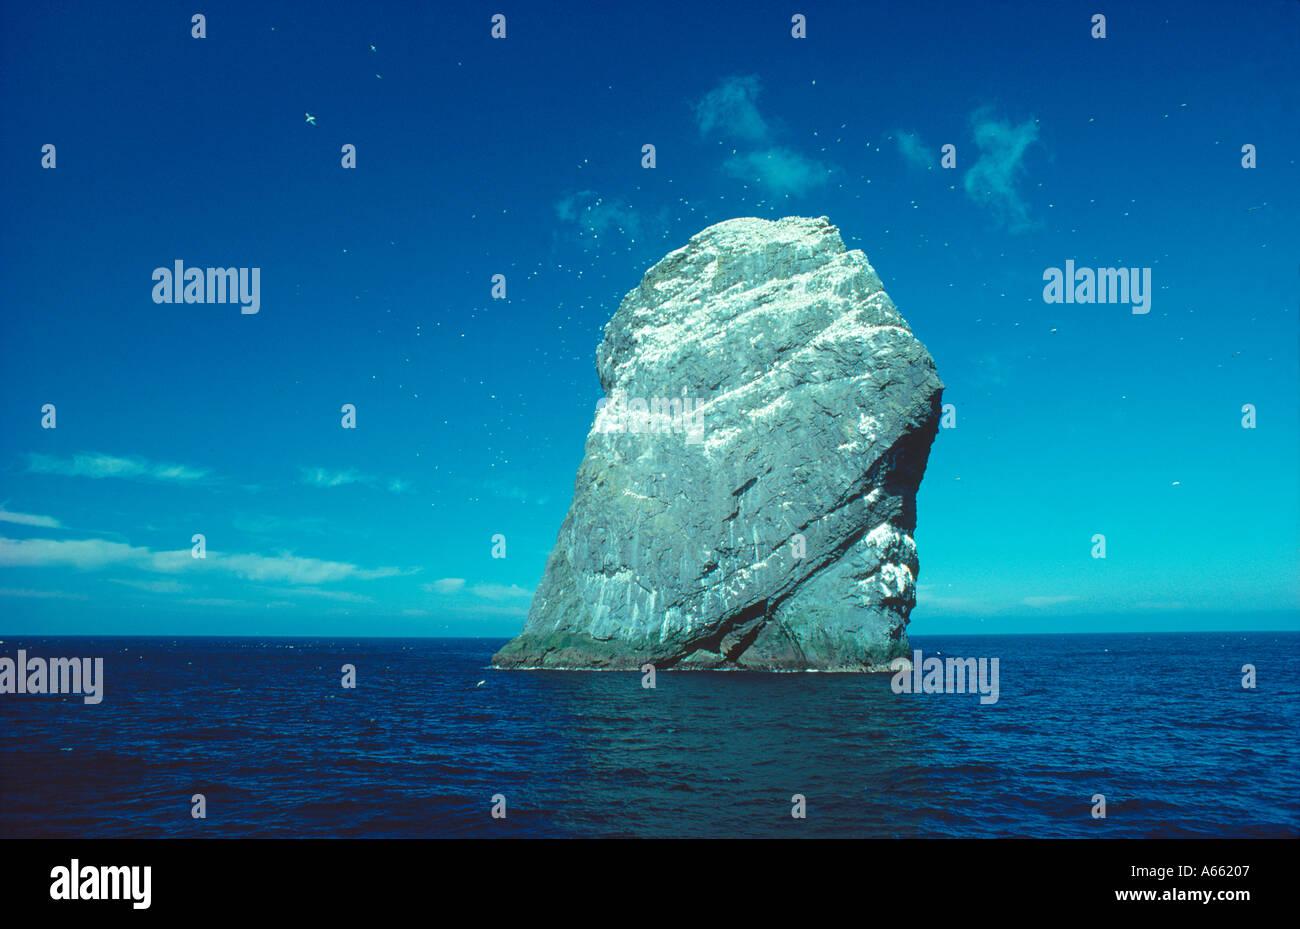 The rock stack of Stac Lee St Kilda Outer Hebrides western Scotland - Stock Image